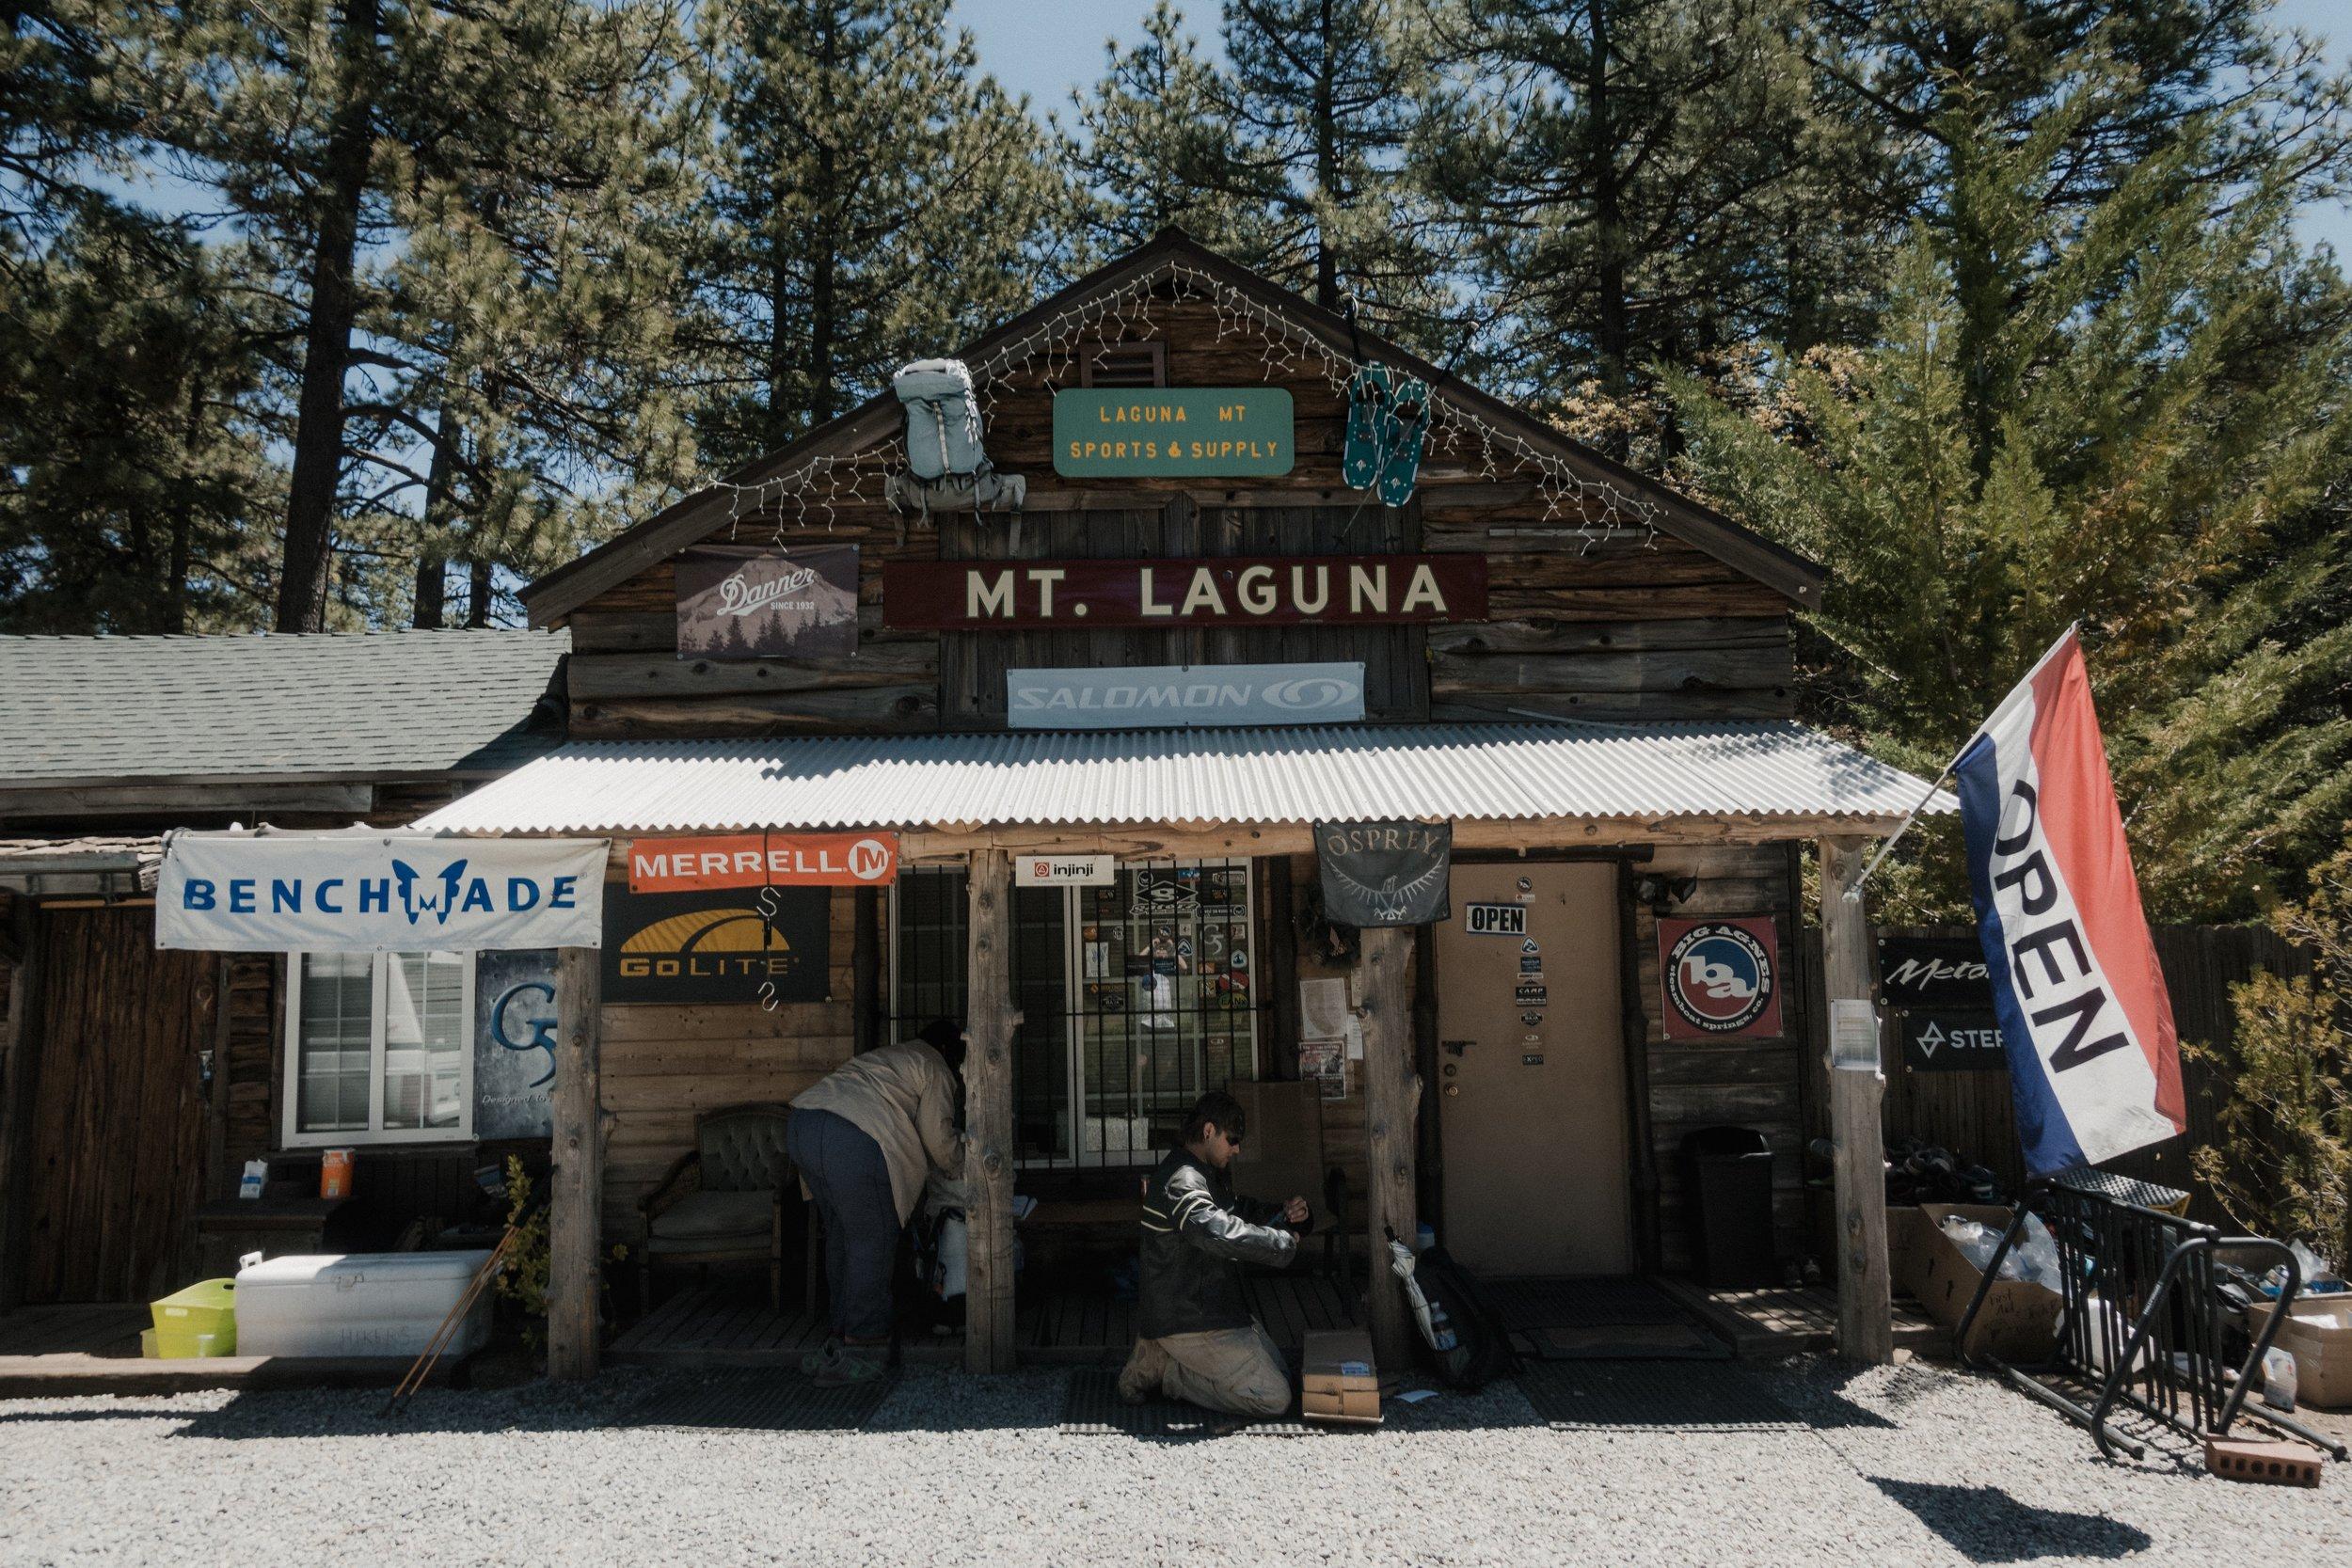 Mt. Laguna gear store